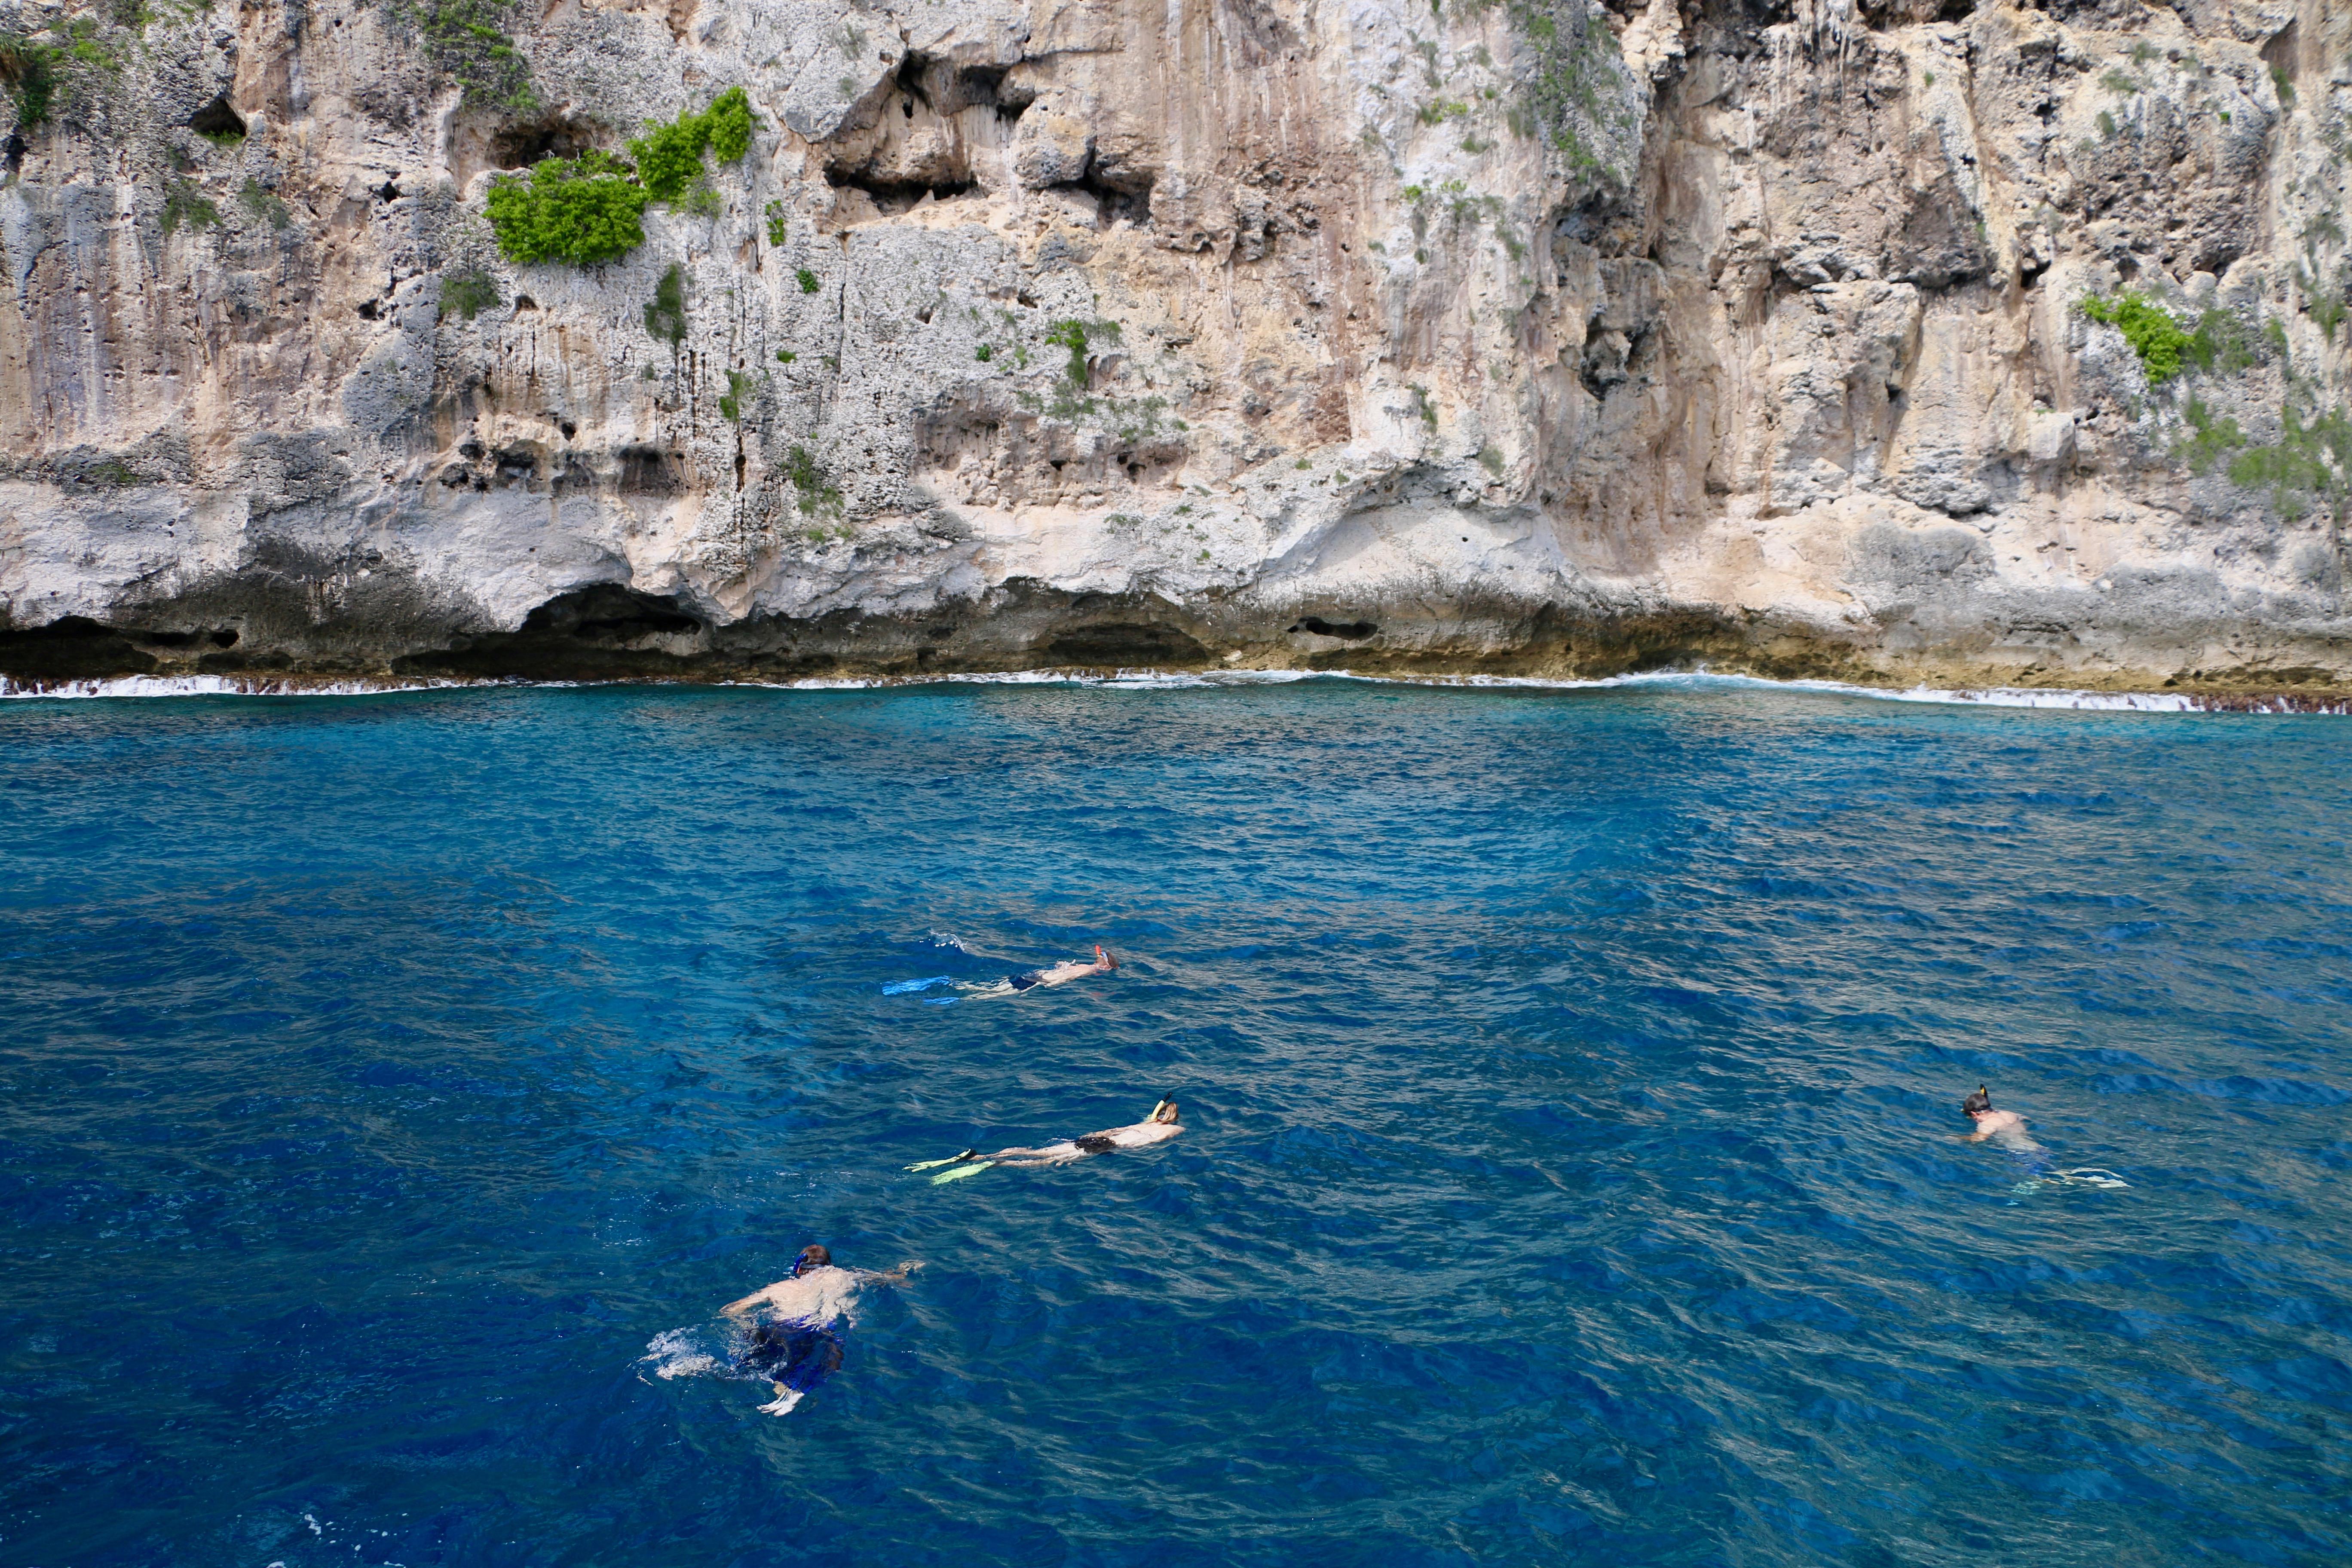 November Rain's crew snorkeling on Walpole Island